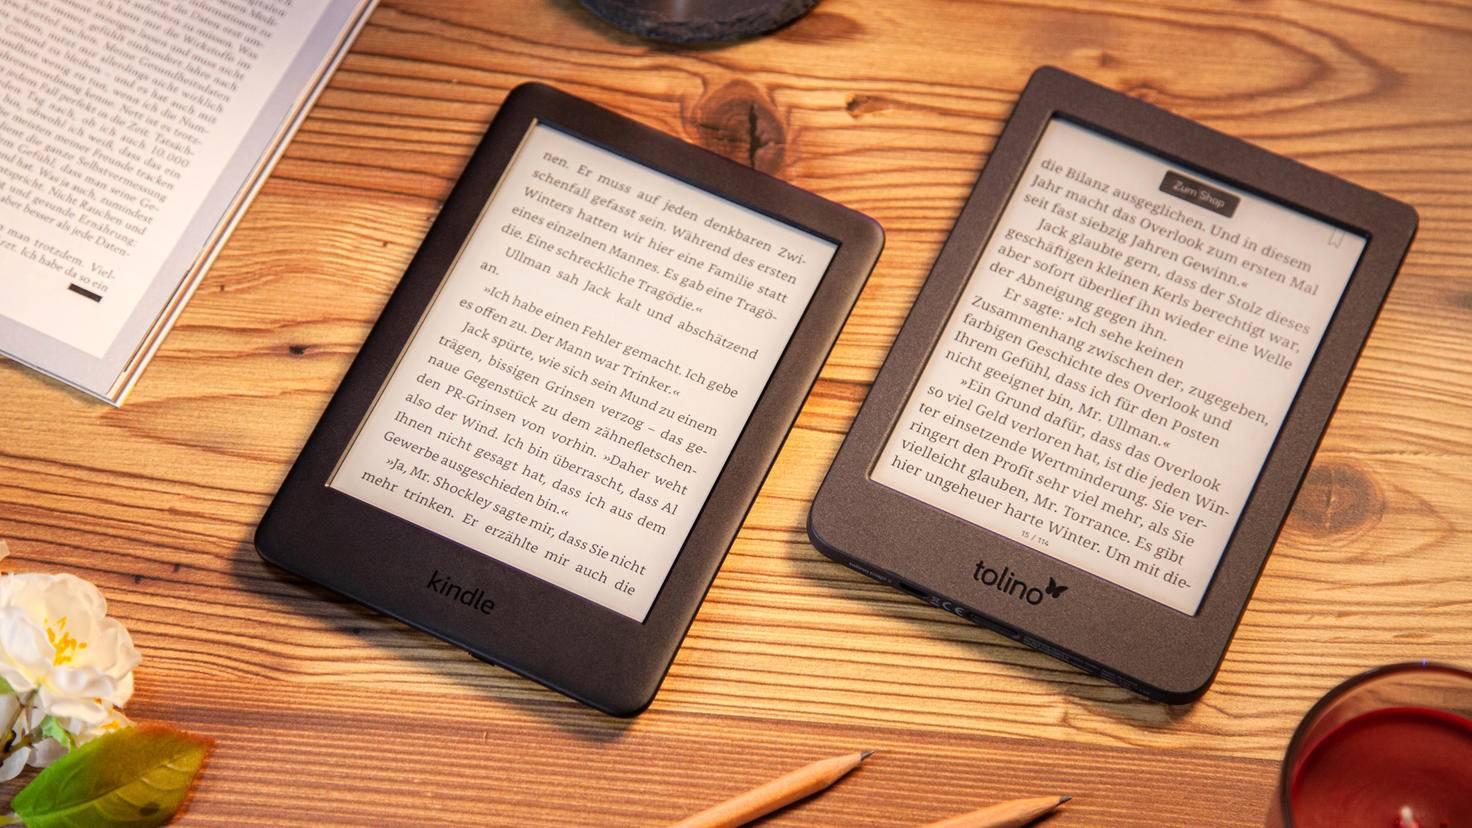 Amazon Kindle 2019 vs Tolino page 2